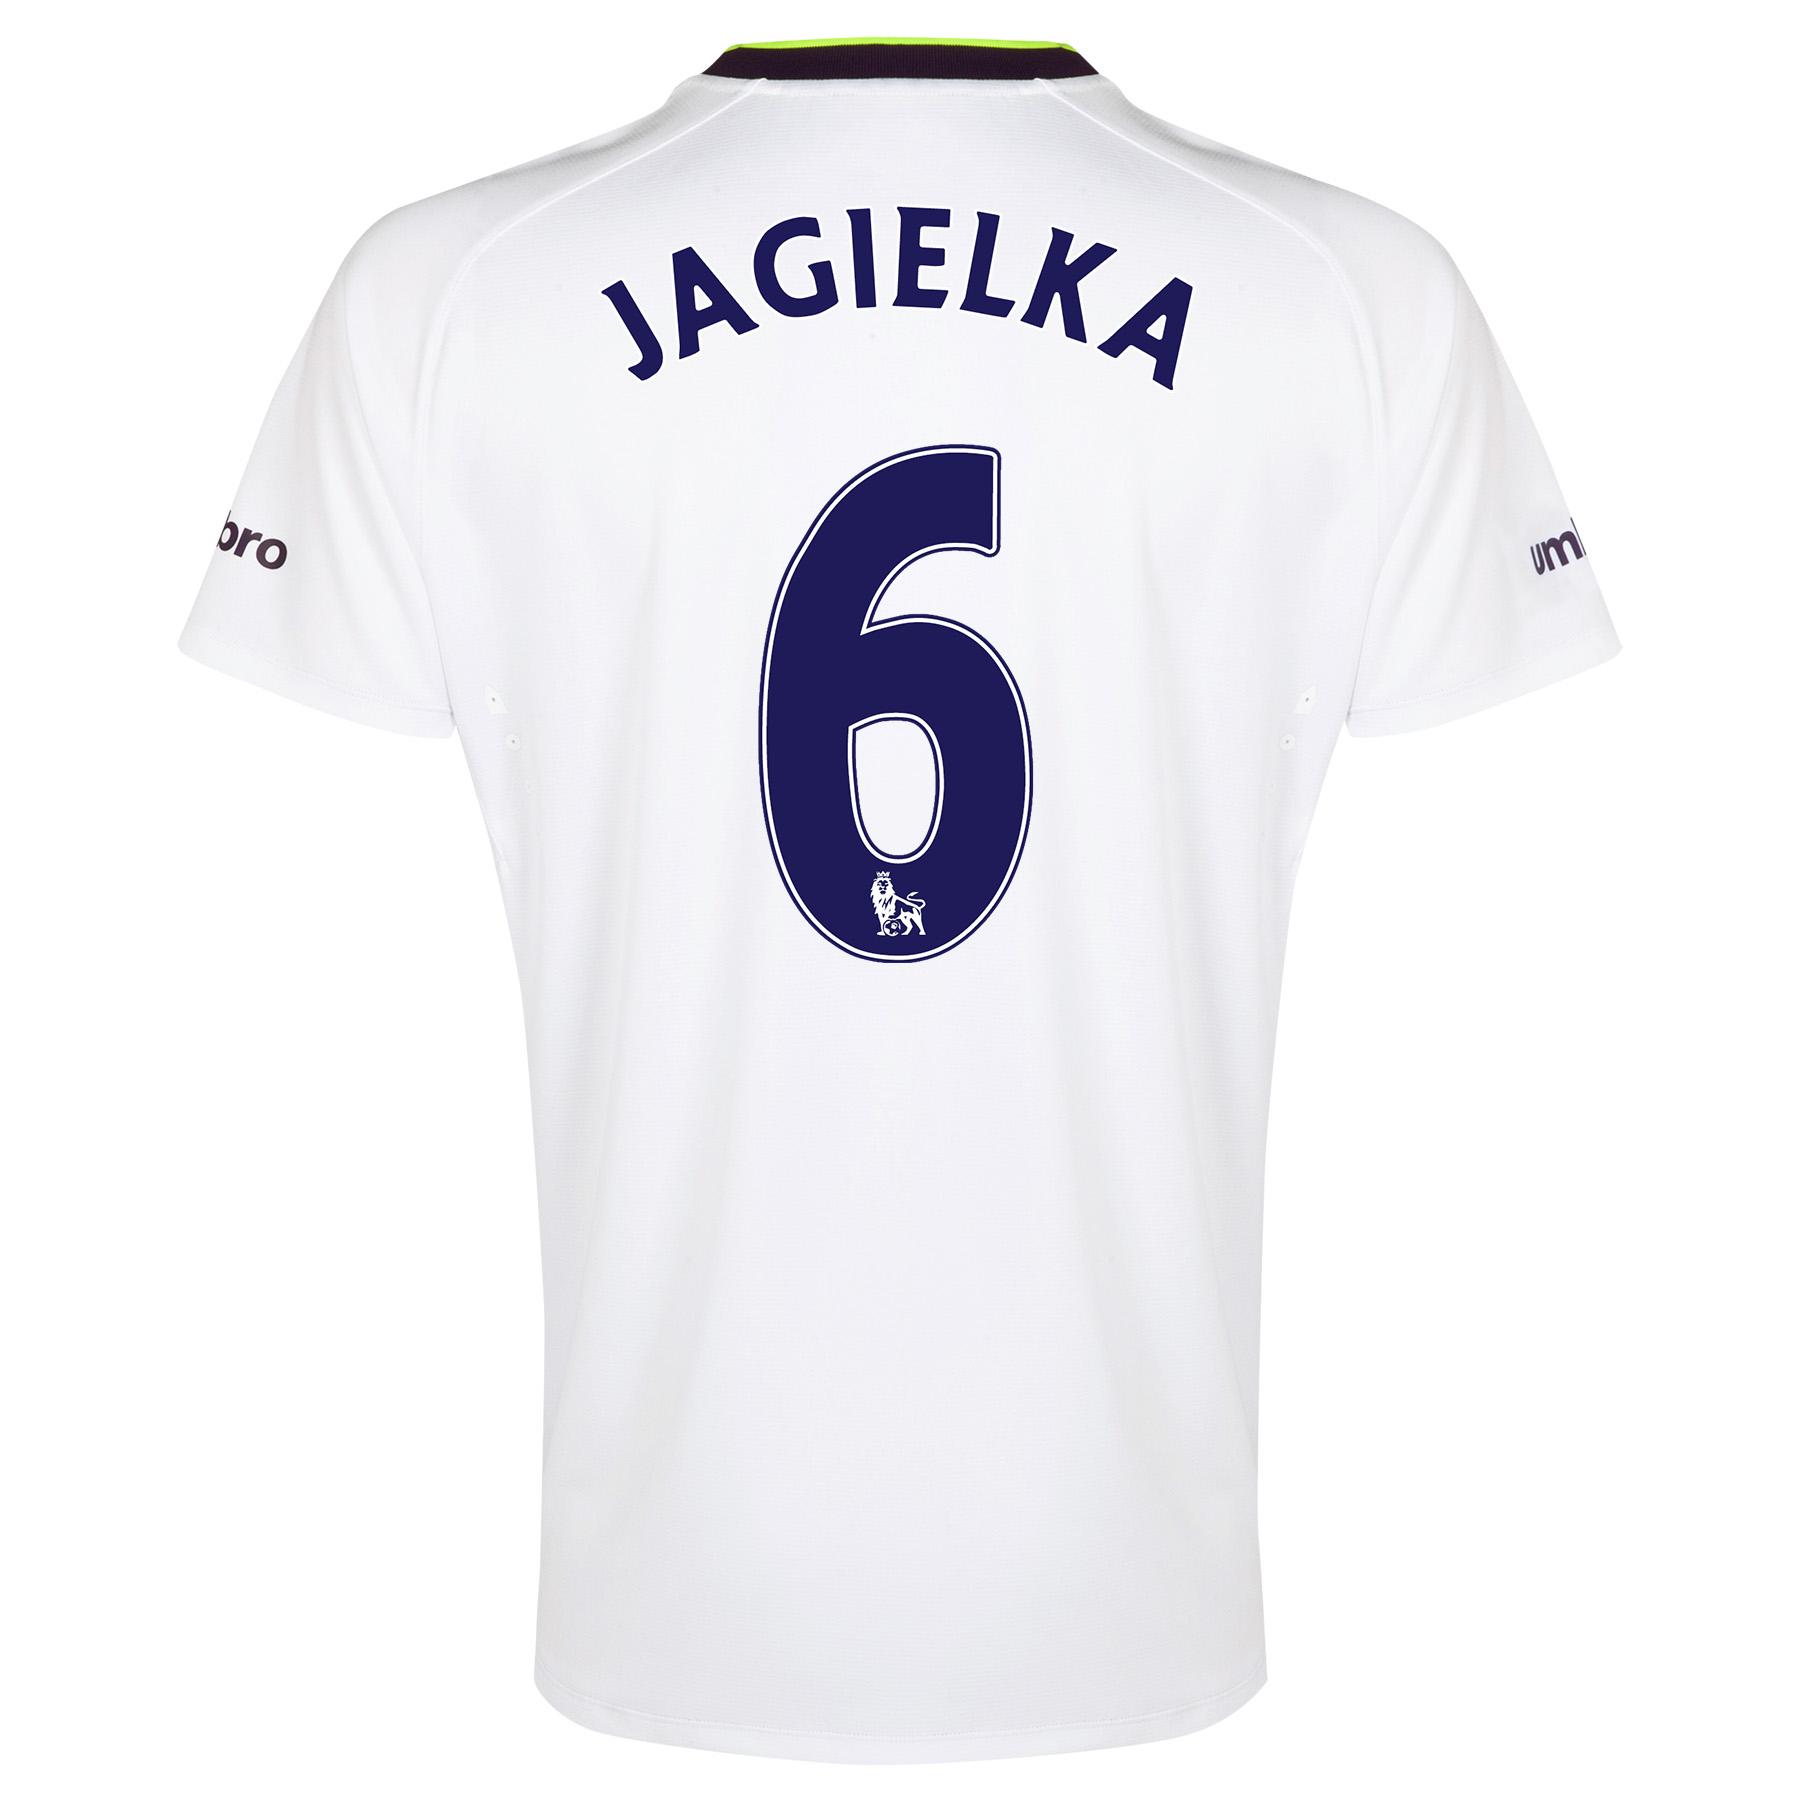 Everton SS 3rd Shirt 2014/15 - Junior with Jagielka 6 printing